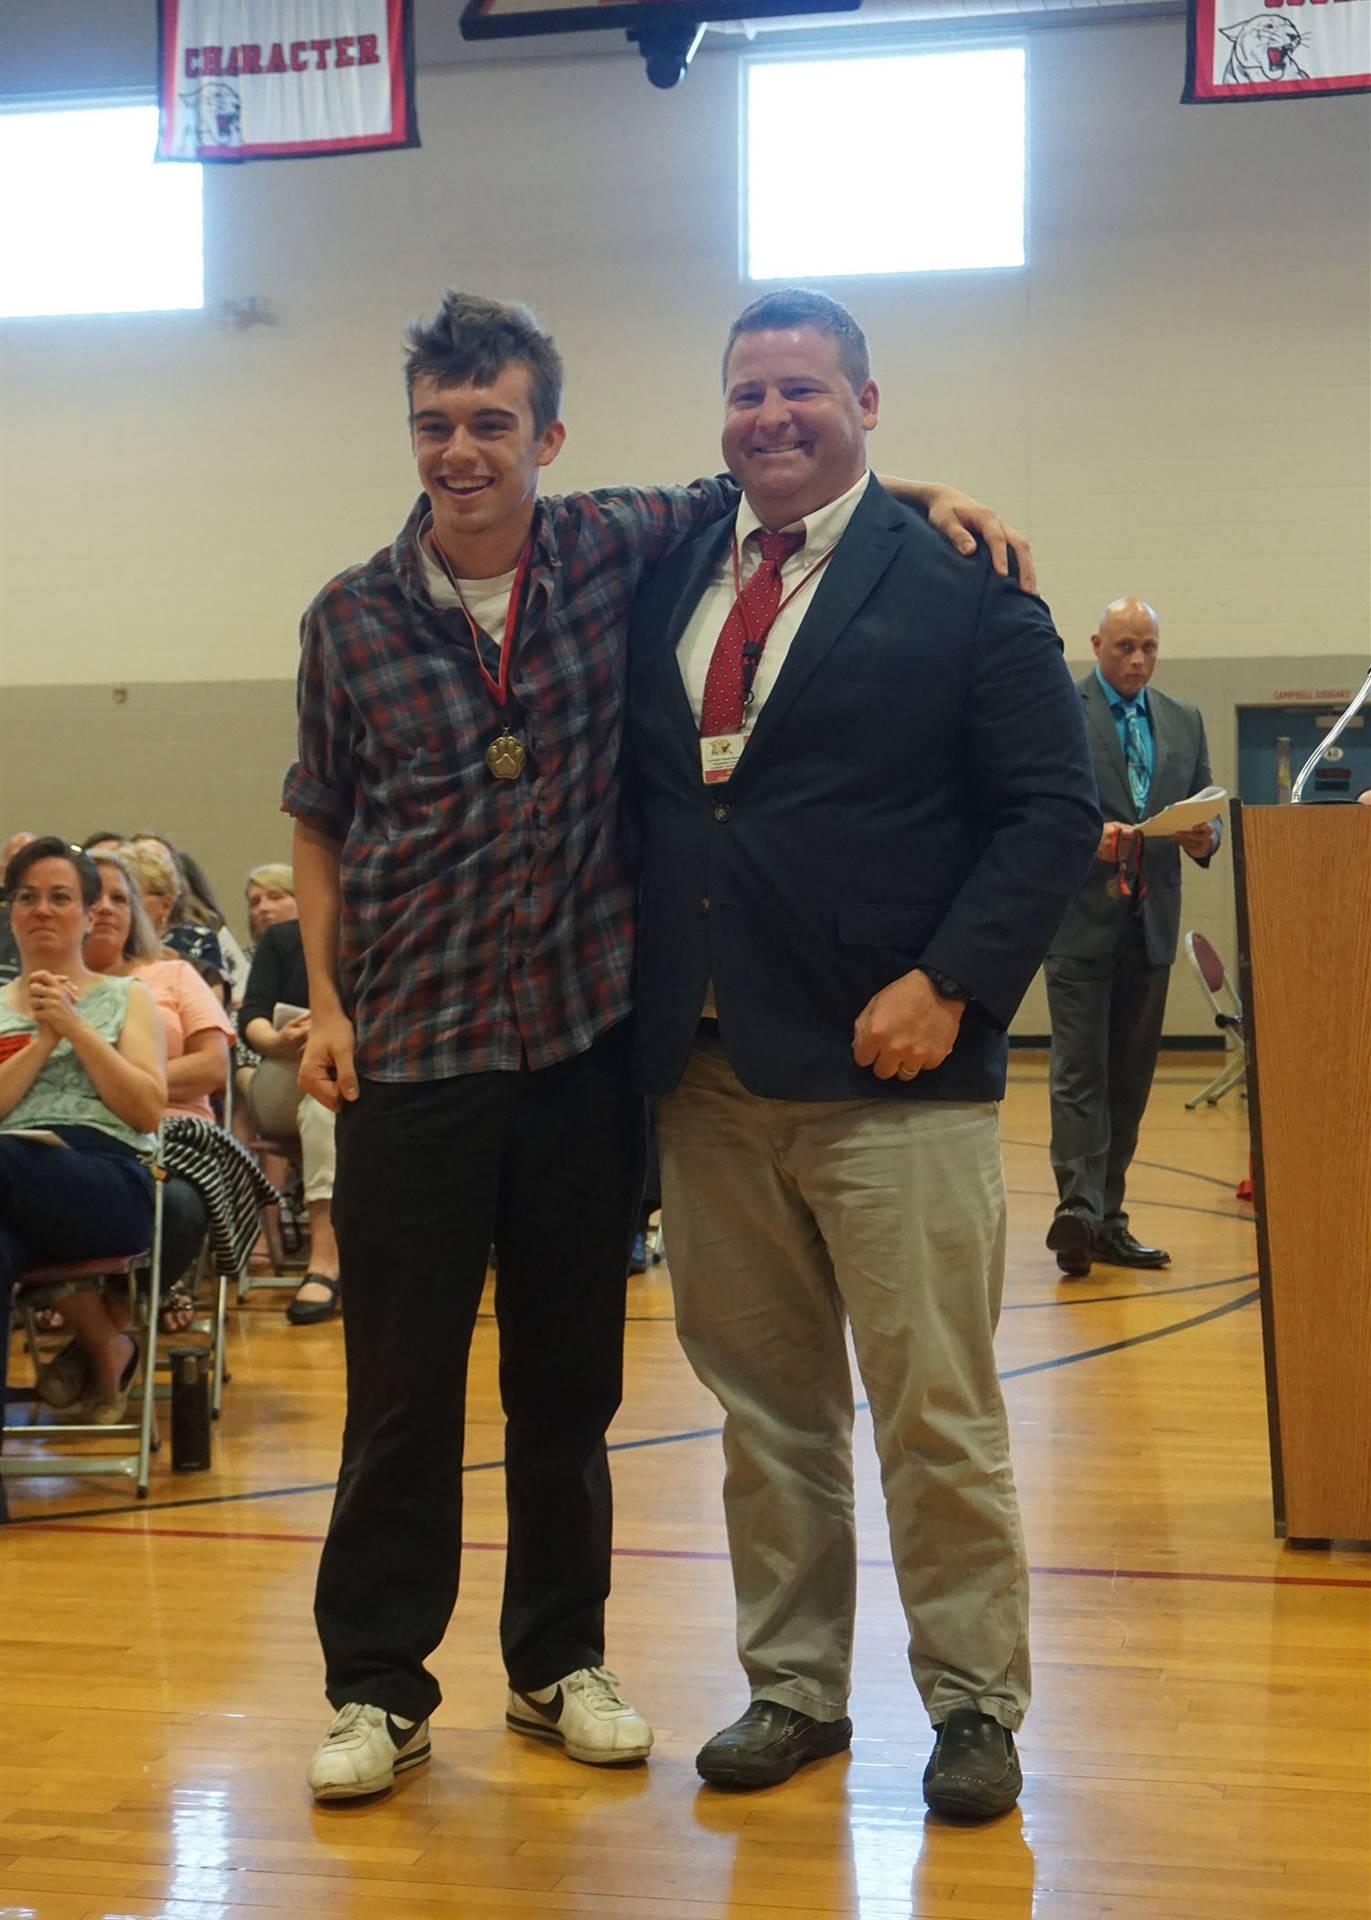 Courage award presented to Mason & Kaitlyn